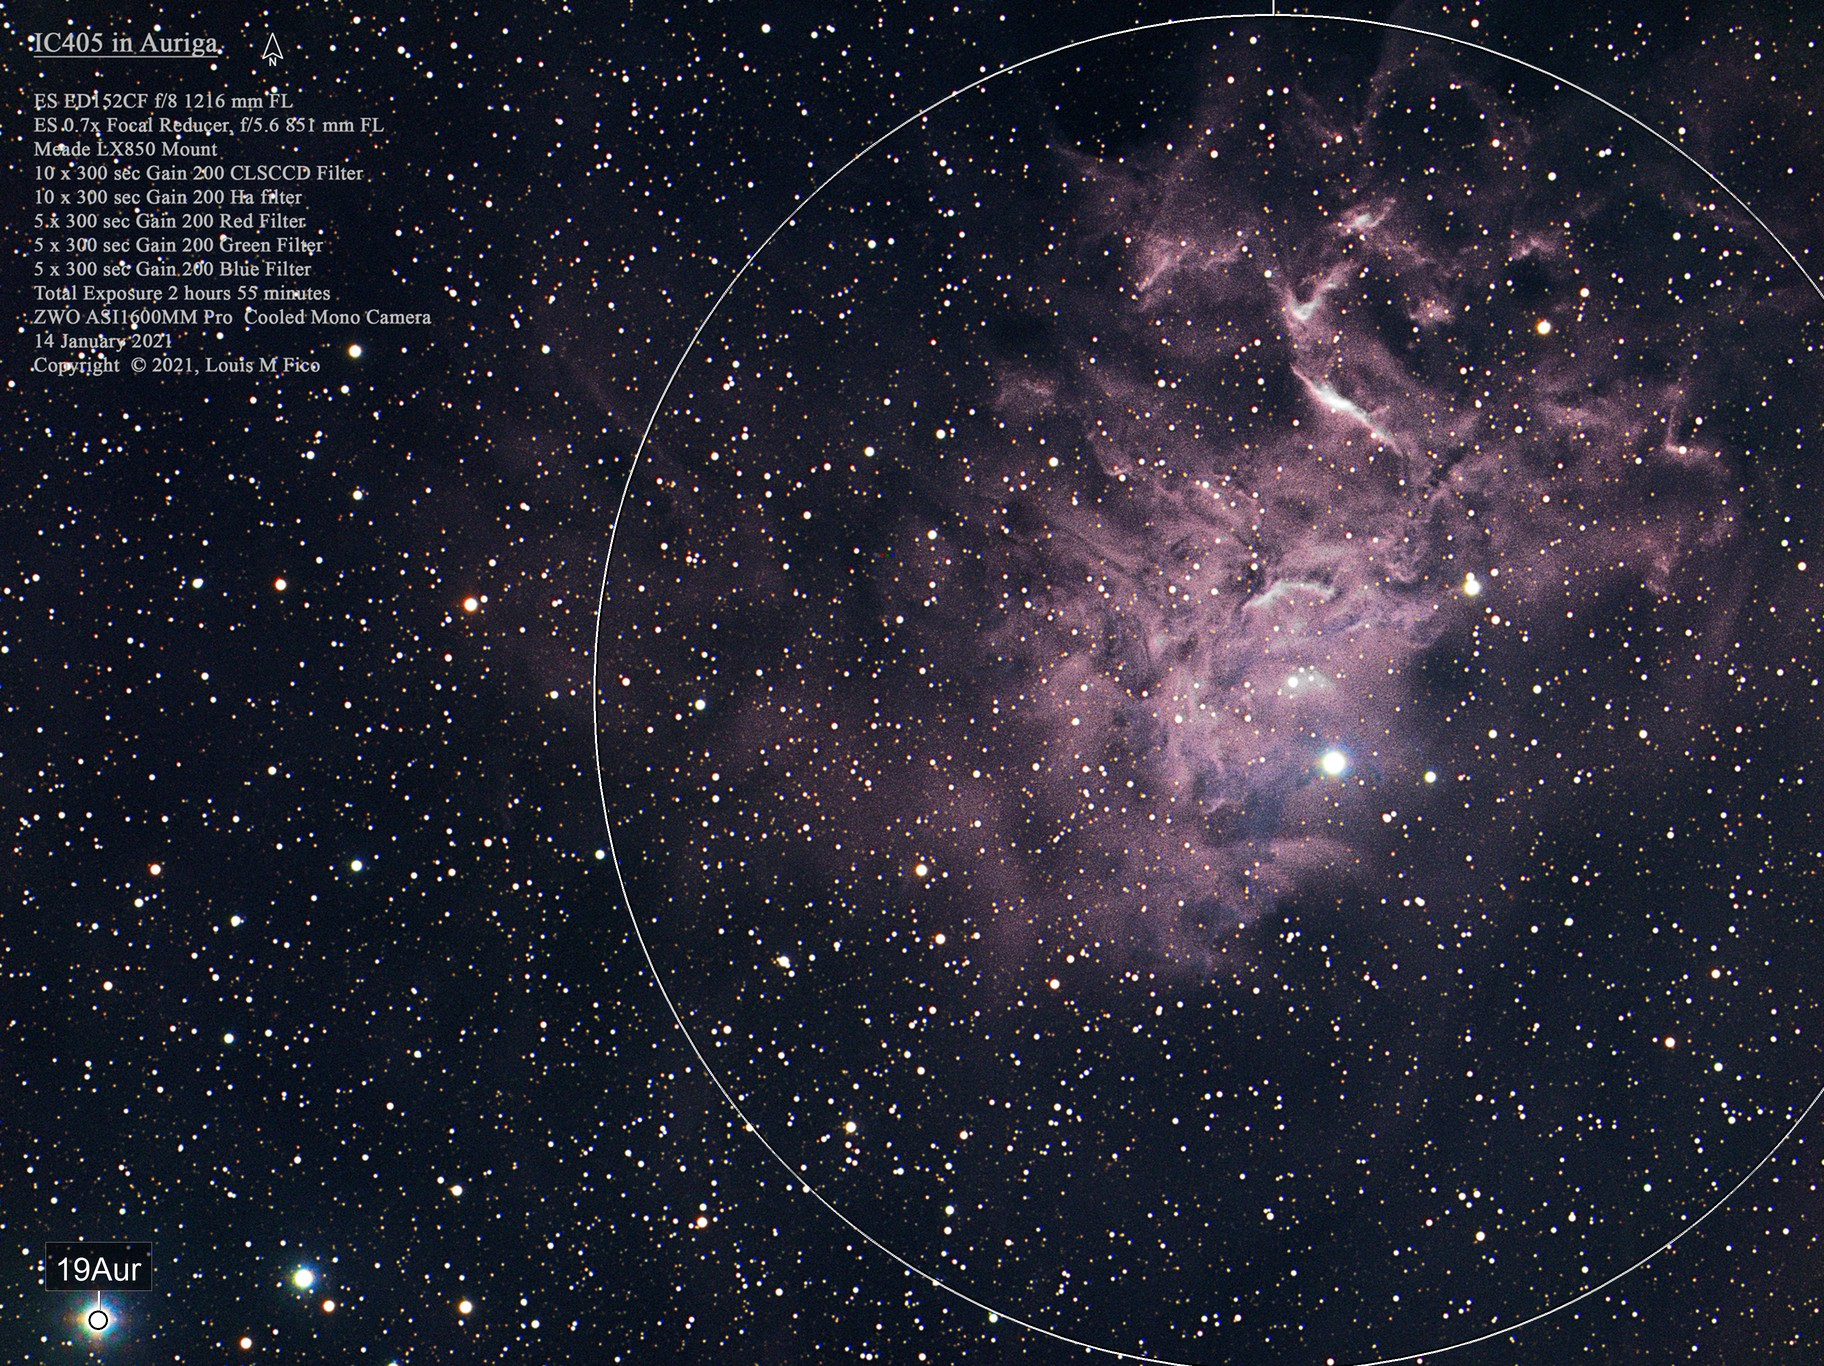 IC405 The Flaming Star Nebula